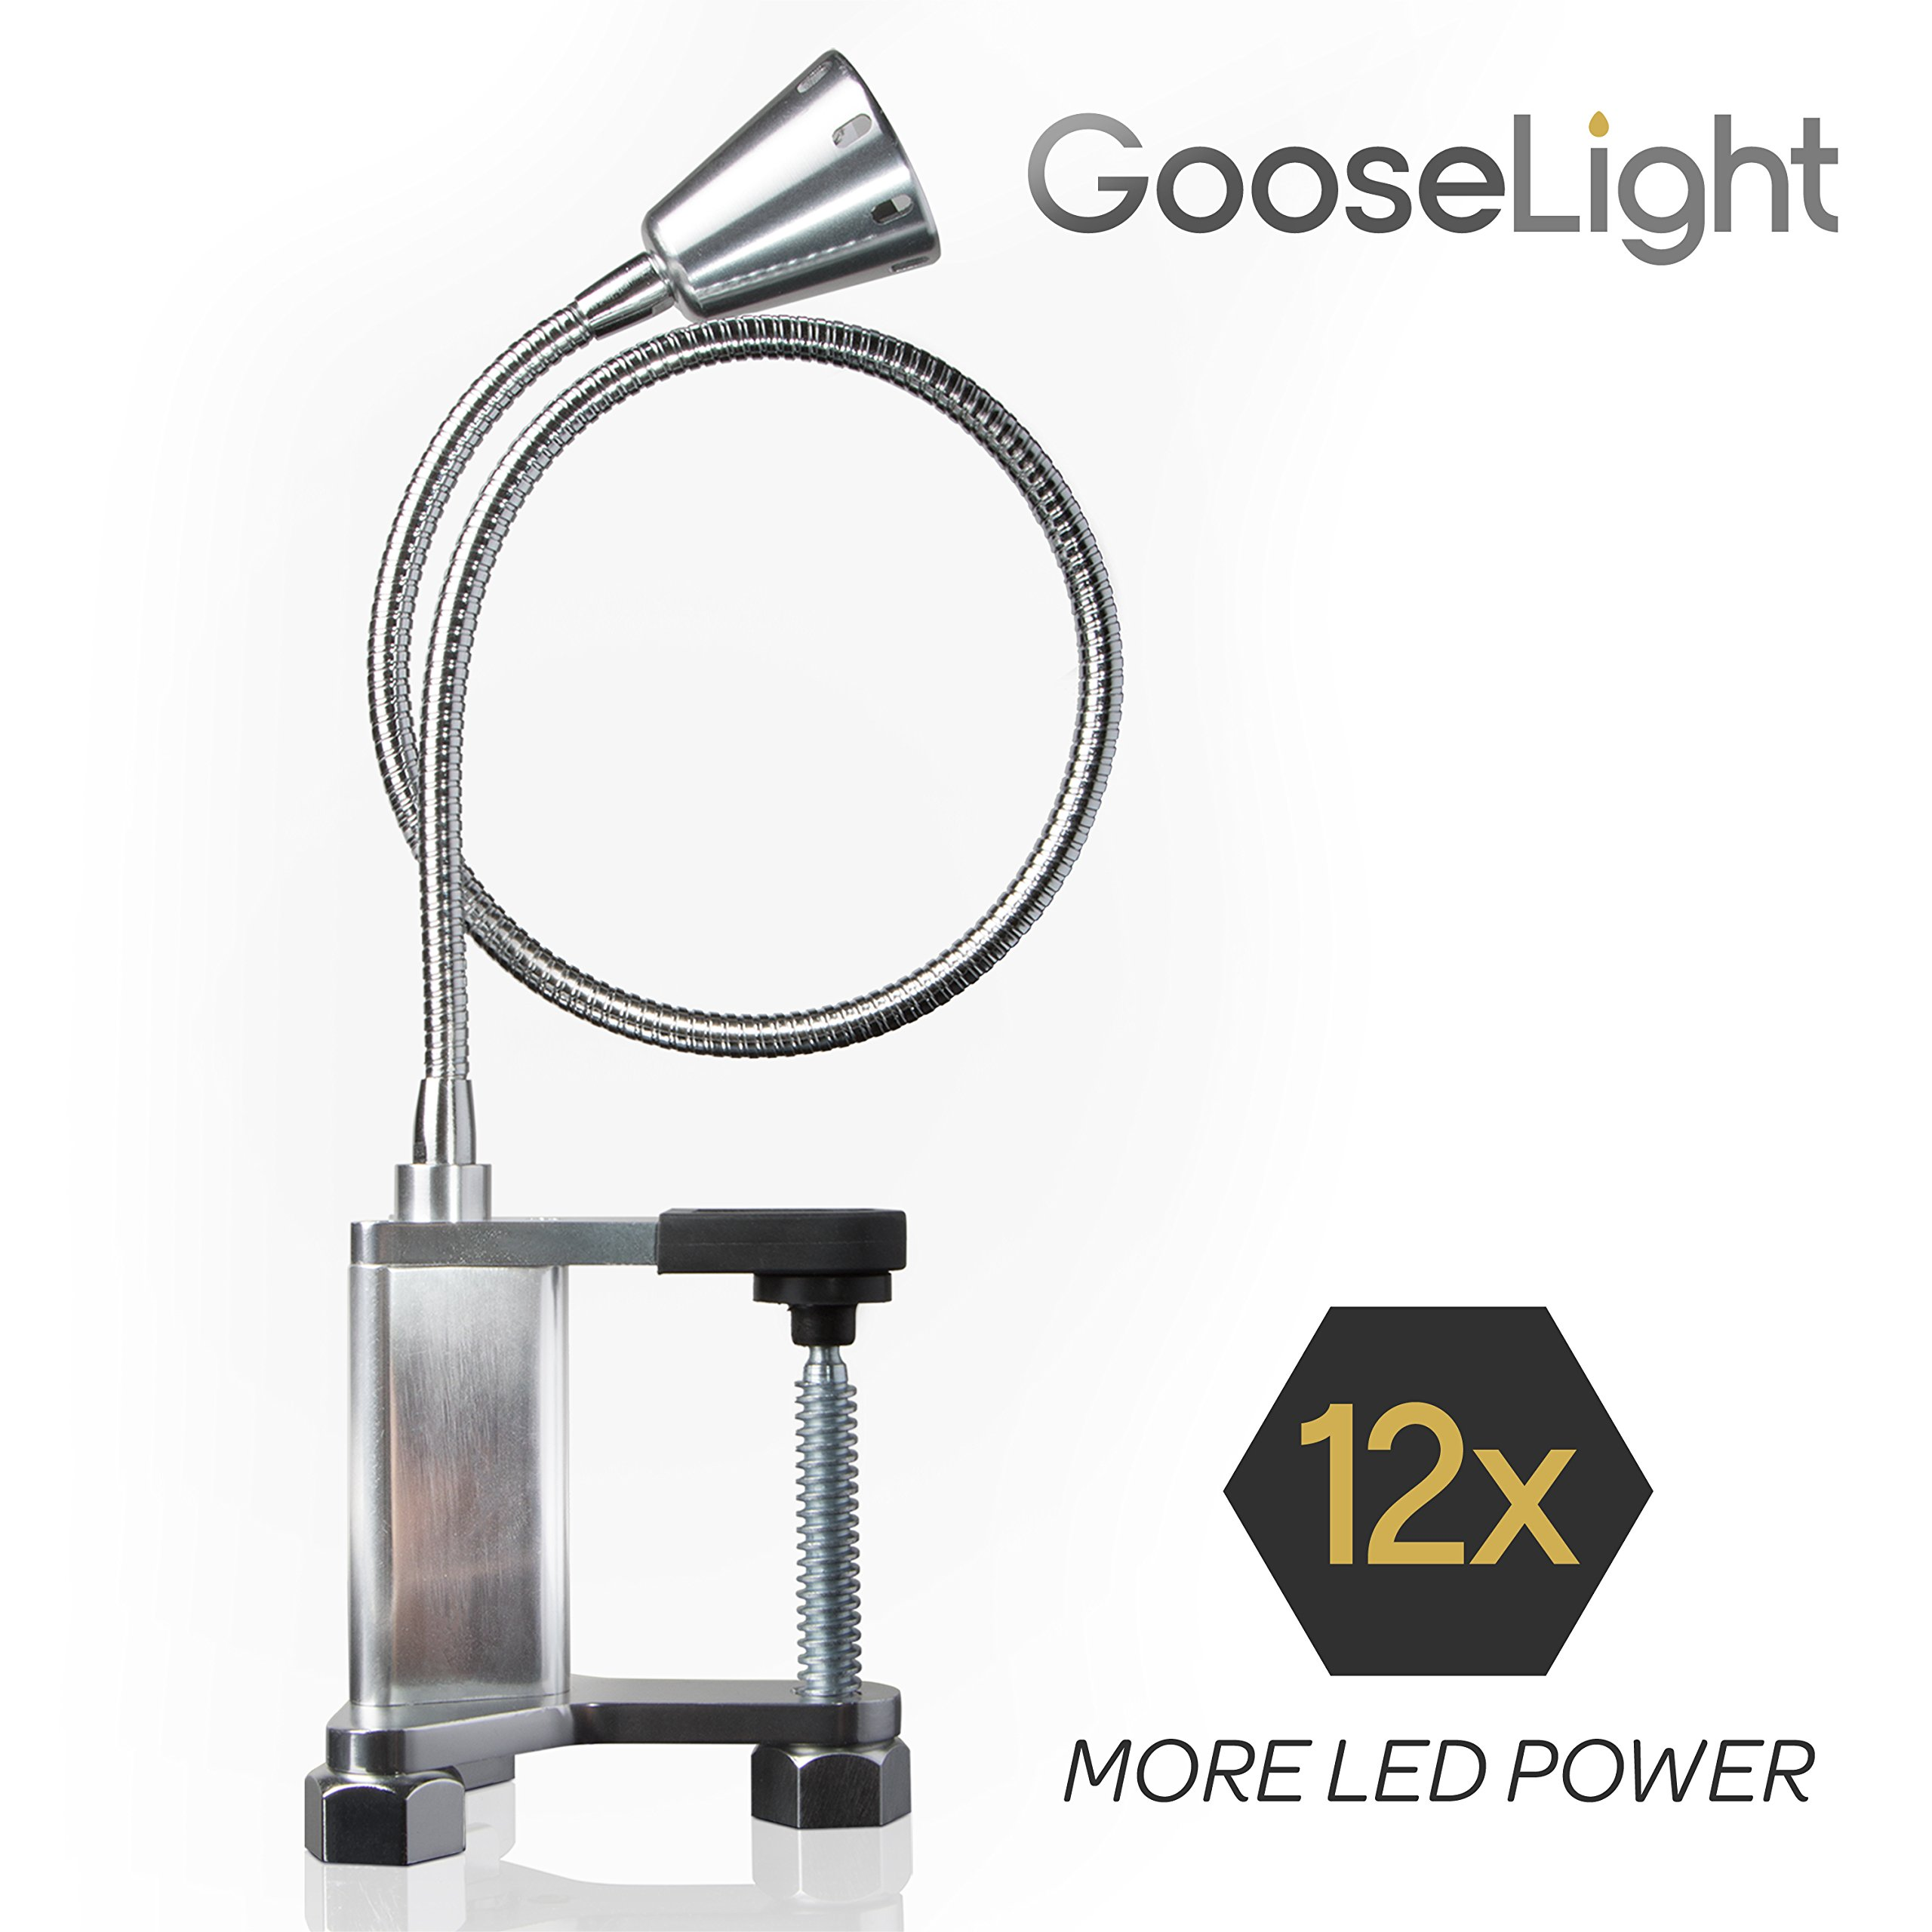 "Livin' Well Magnetic LED Clamp Light - ""GooseLight"" All Purpose Gooseneck Lamp Task Light and Patio BBQ Grill Light w/ 12 Powerful LED Lamp Bulbs"